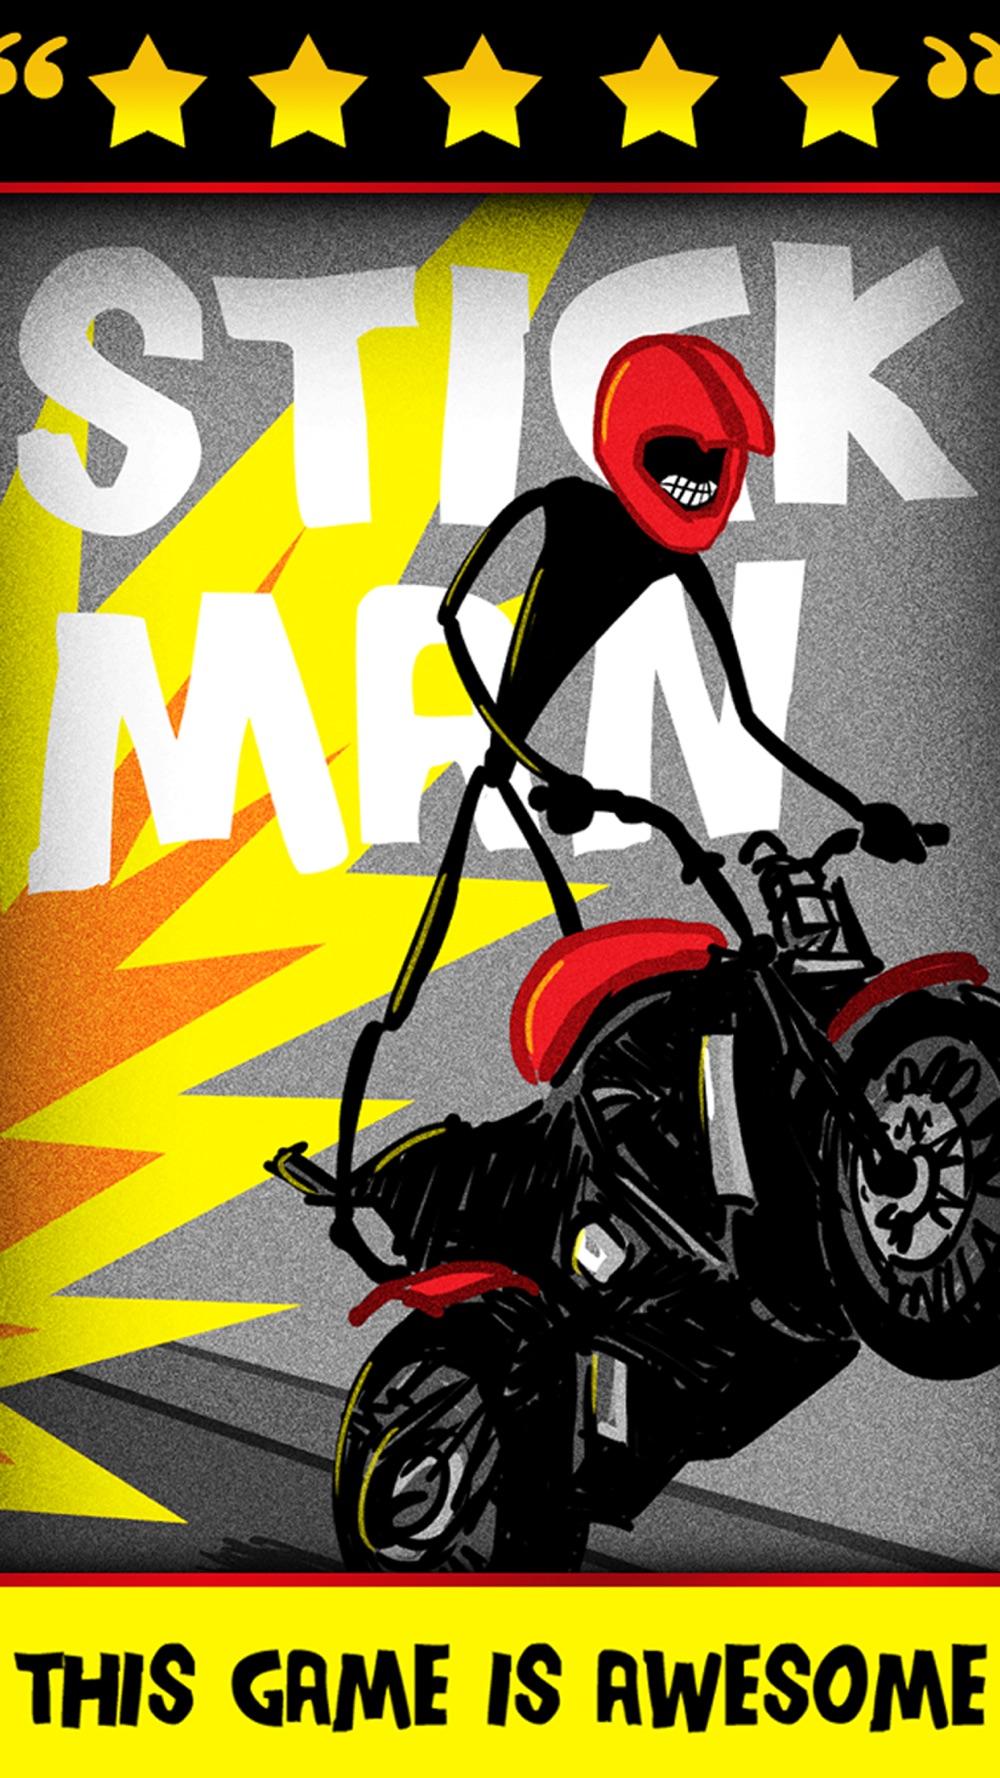 Stickman Street Bike Motorcycle Highway Race – FREE Multiplayer Racing Game Cheat Codes